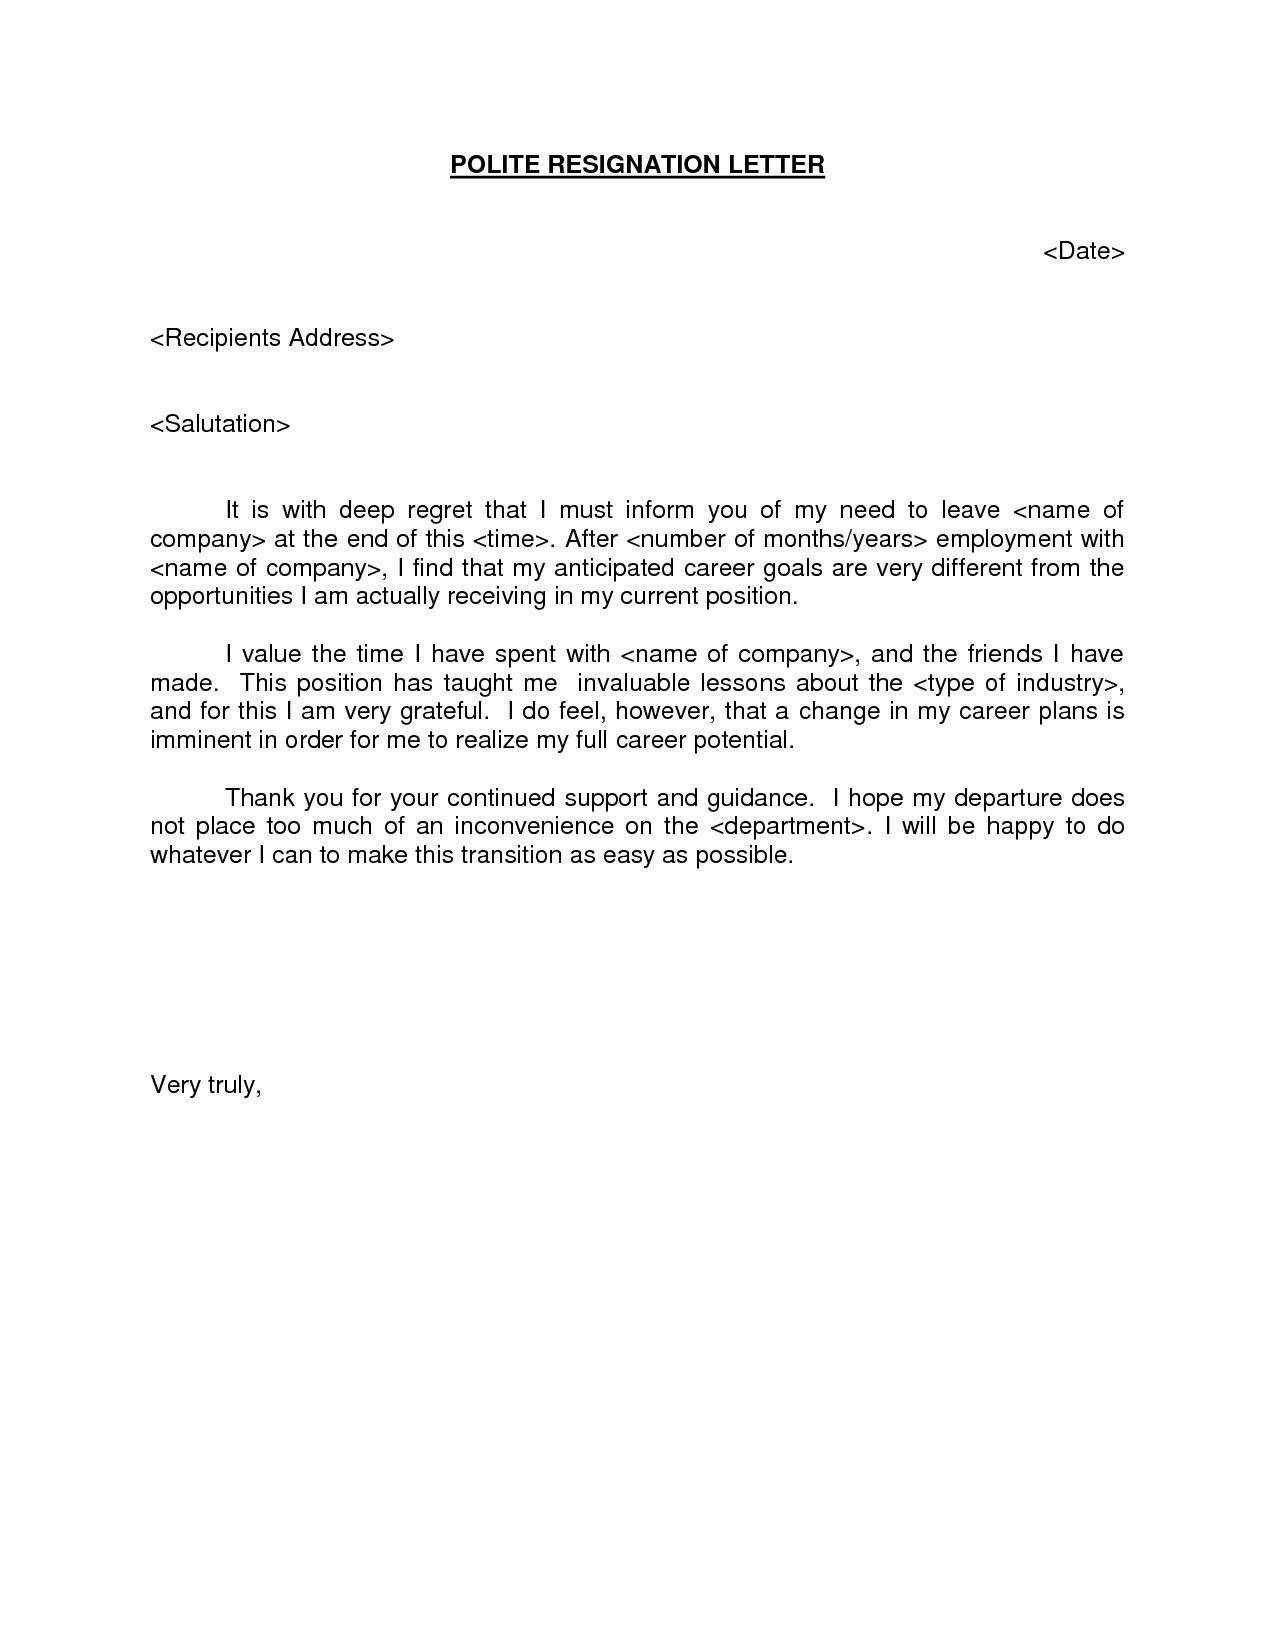 School Sponsorship Letter Template - Donation Letter Template for Schools Unique Polite Resignation